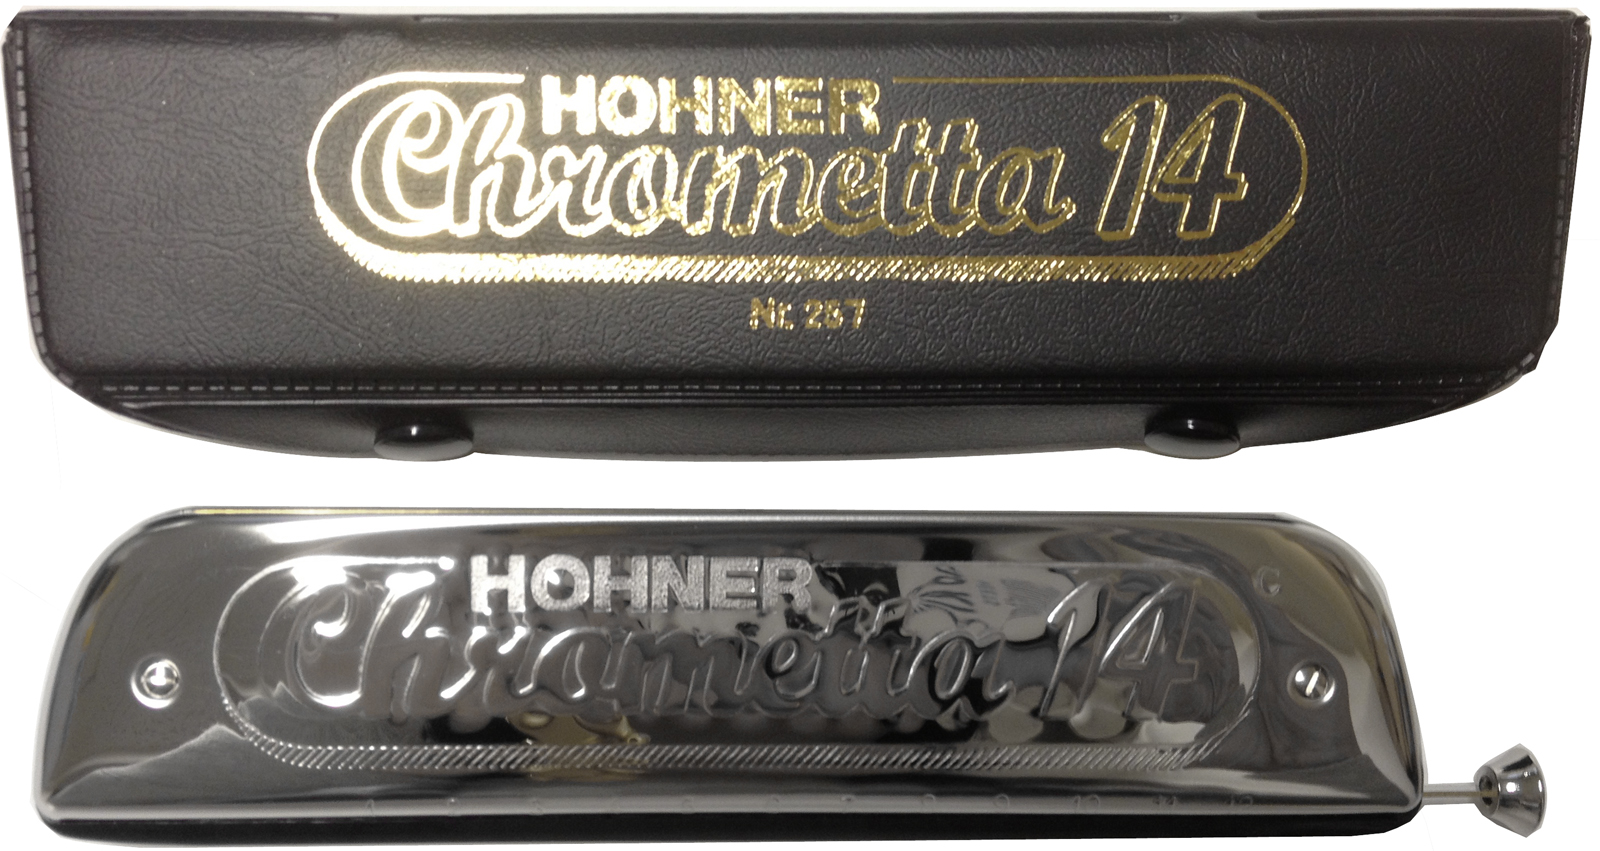 HOHNER ( ホーナー ) クロメッタ14 クロマチックハーモニカ 14穴 C調 スライド式 3オクターブ半 ハーモニカ 257/56 Chrometta 14 楽器 Chromatic Harmonica 北海道/沖縄/離島不可=送料実費請求